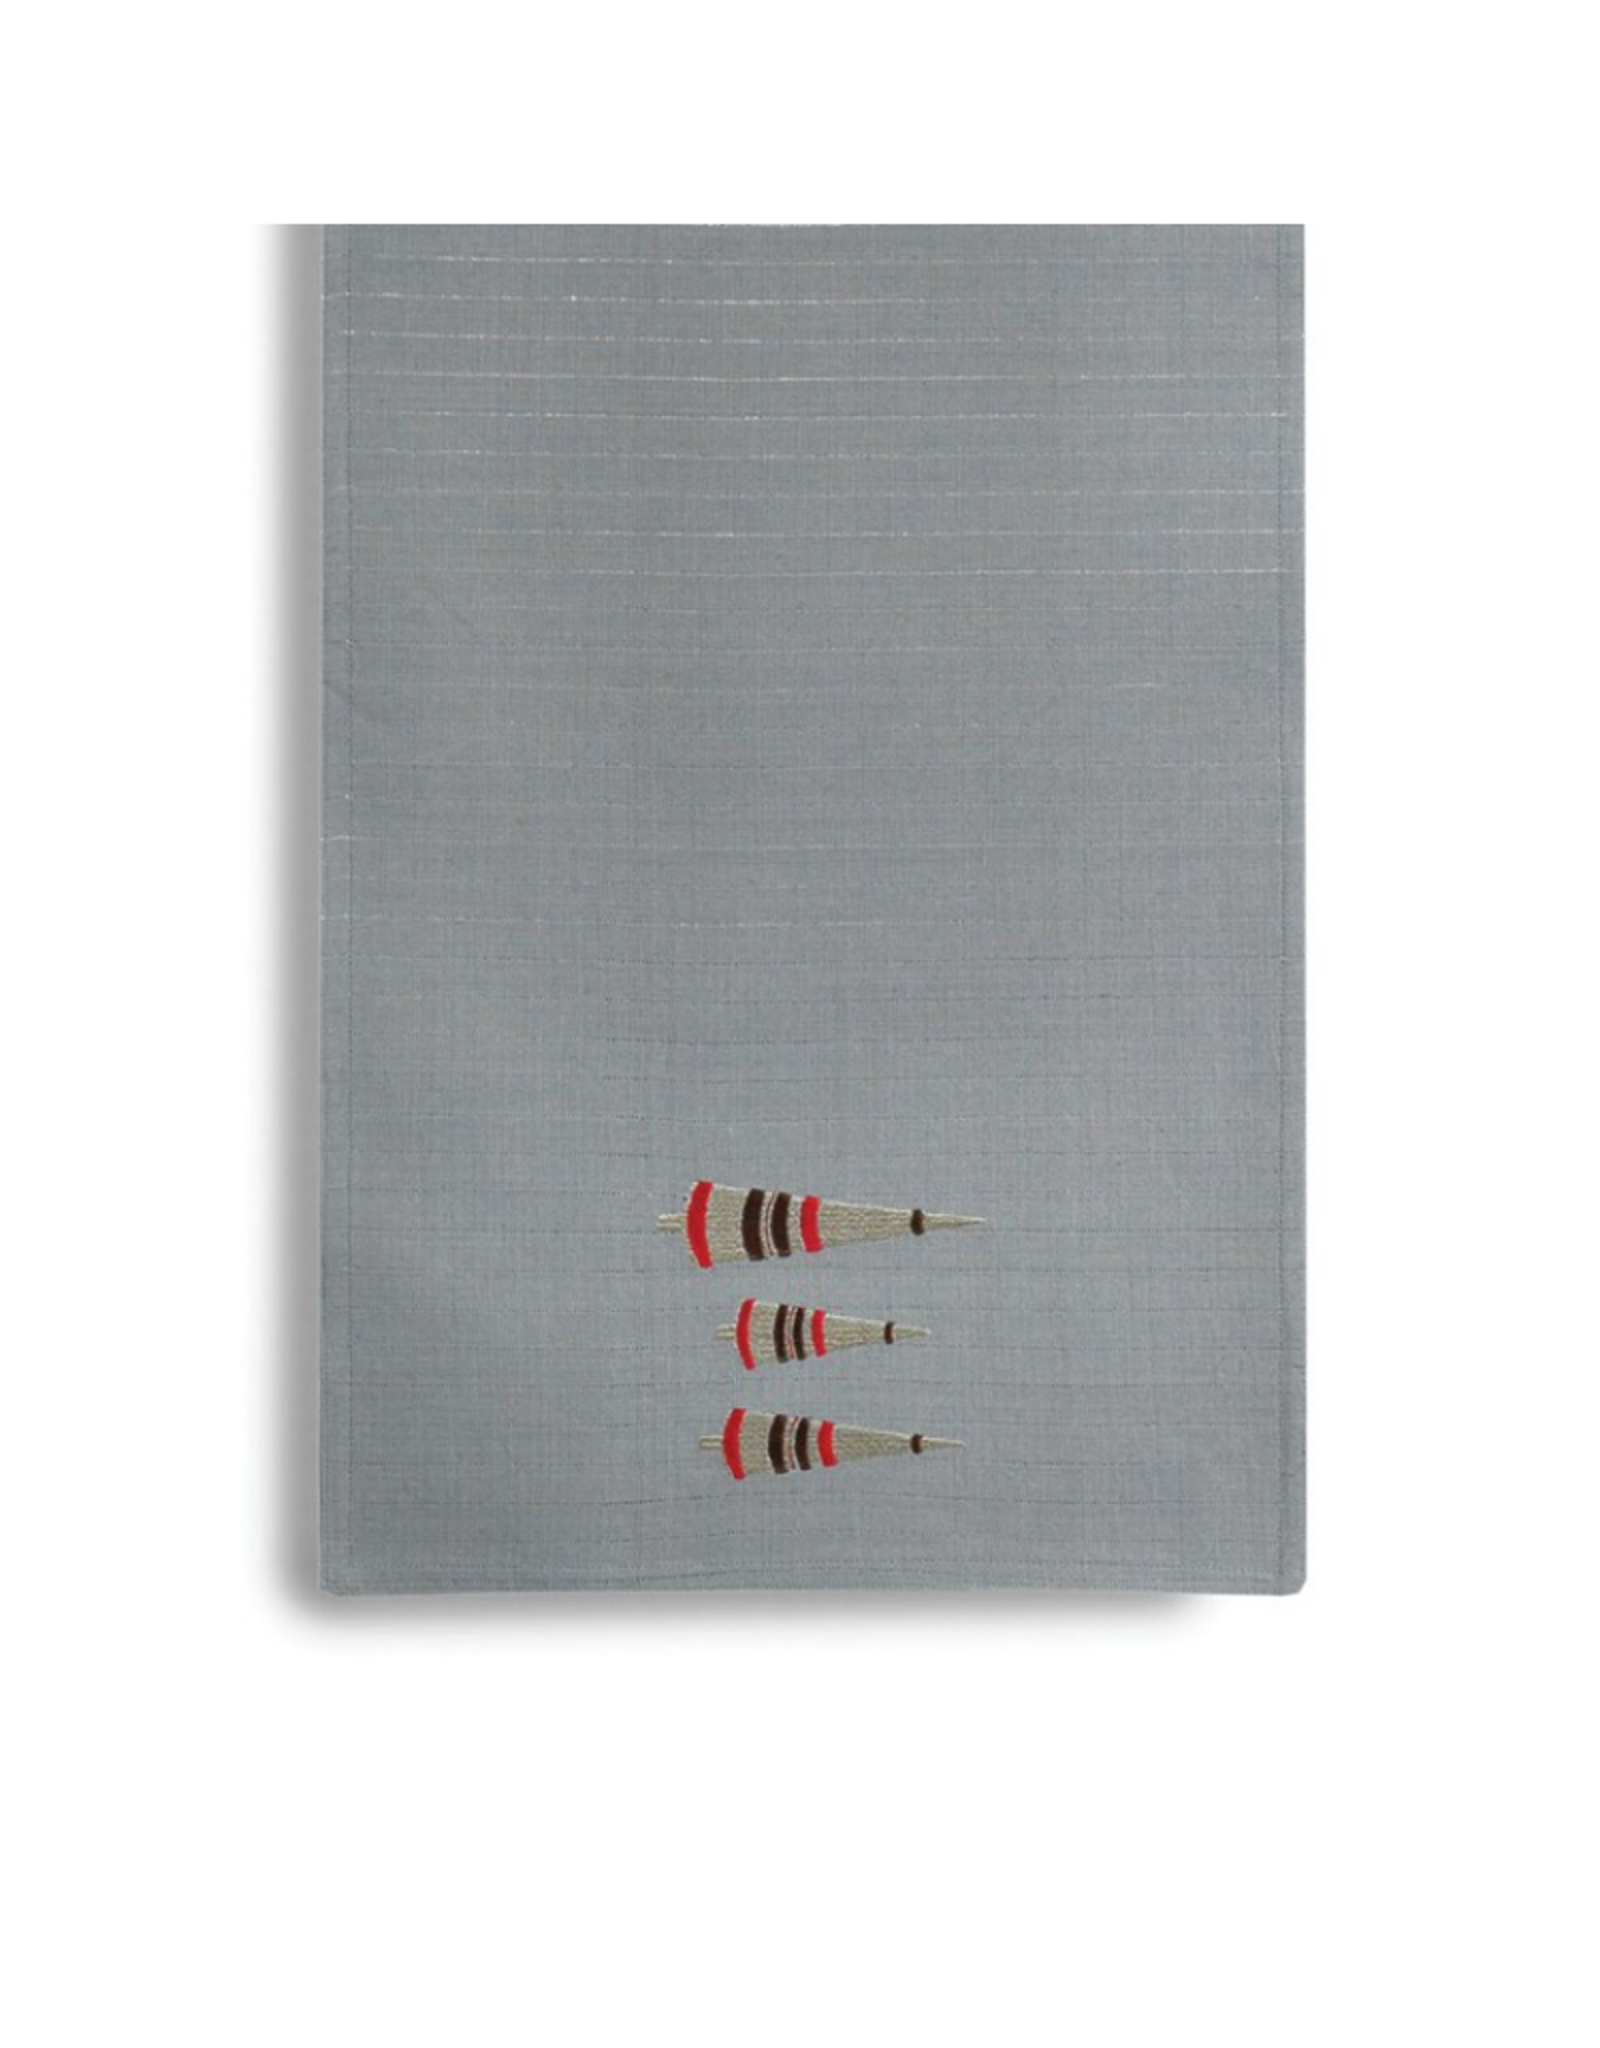 Harman Chemin de table 13 x 72'' avec sapins brodés